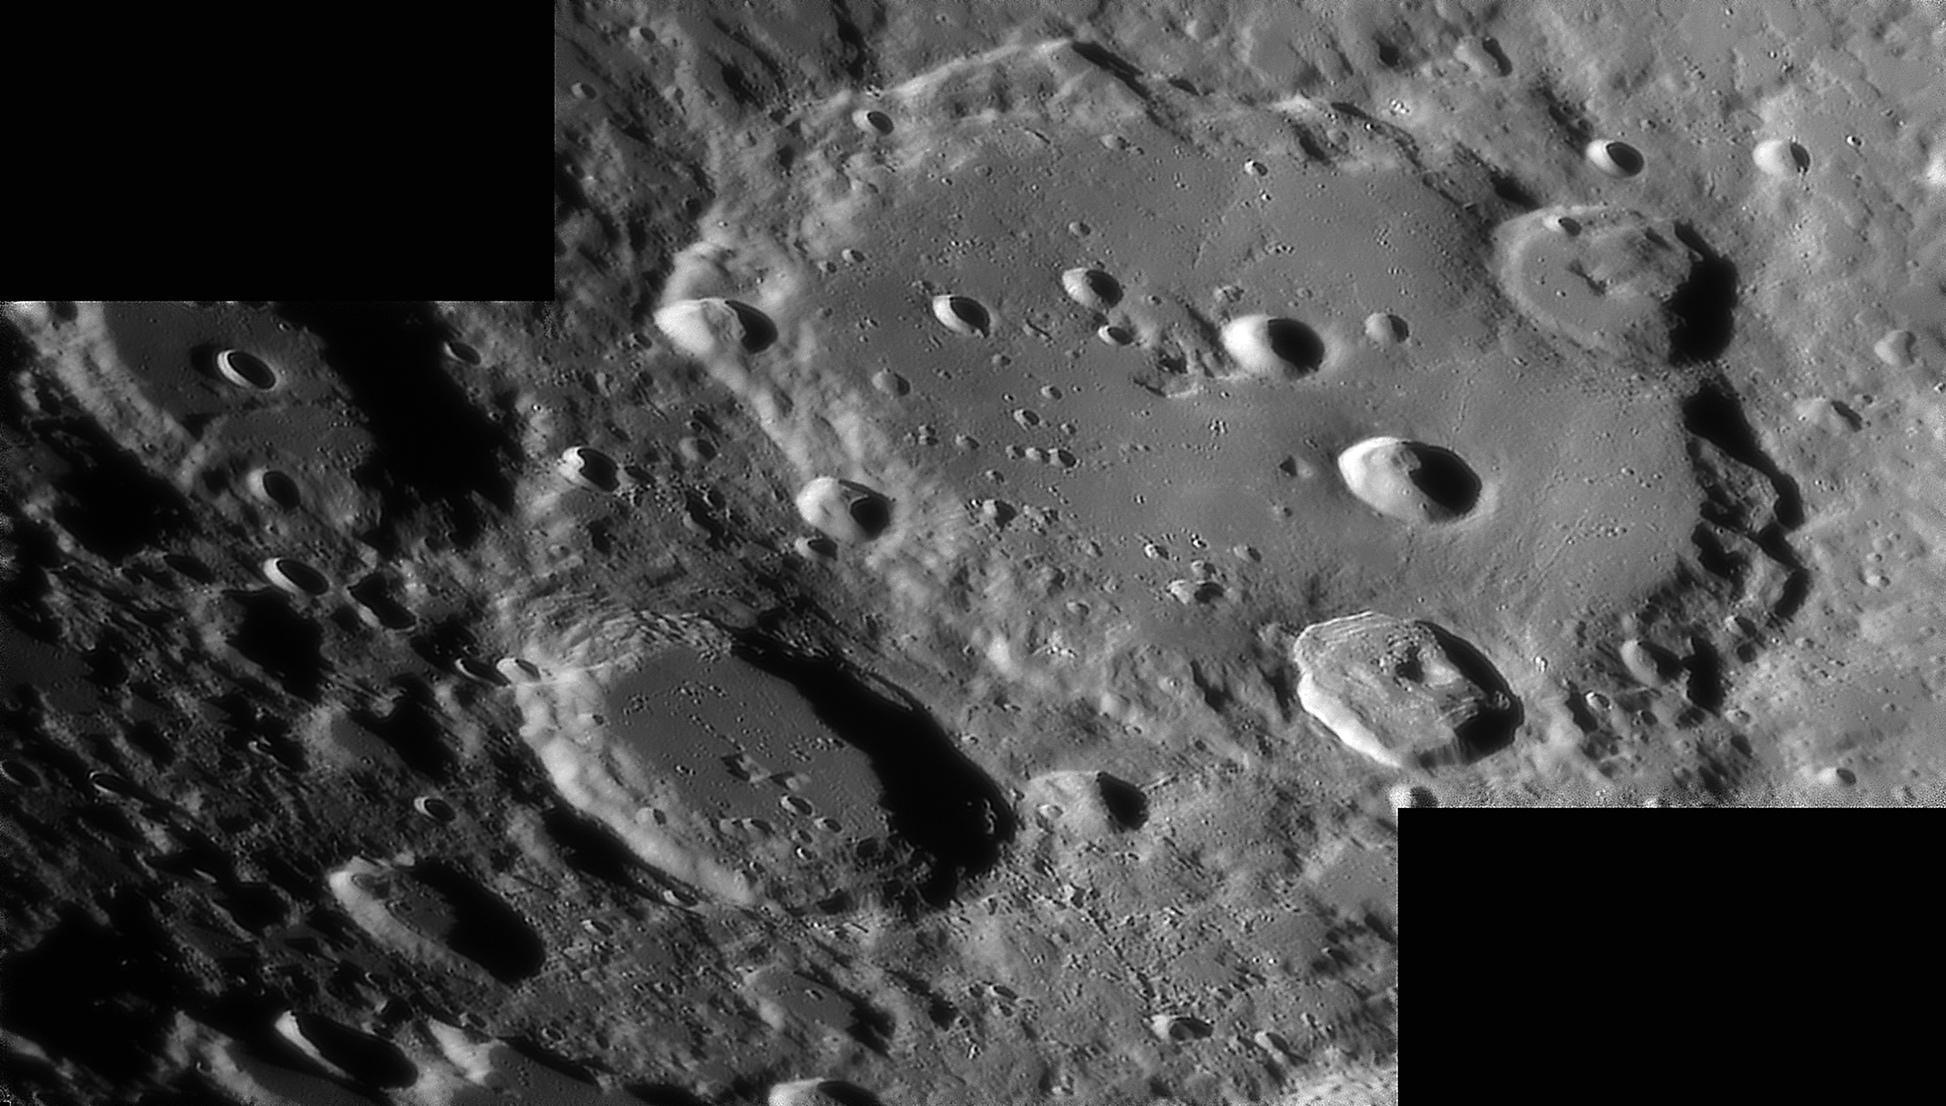 large.moon_CAS_03_04_2020_CLAVIUS.jpg.606aebffd49d719b4663fcf7f1181f9f.jpg